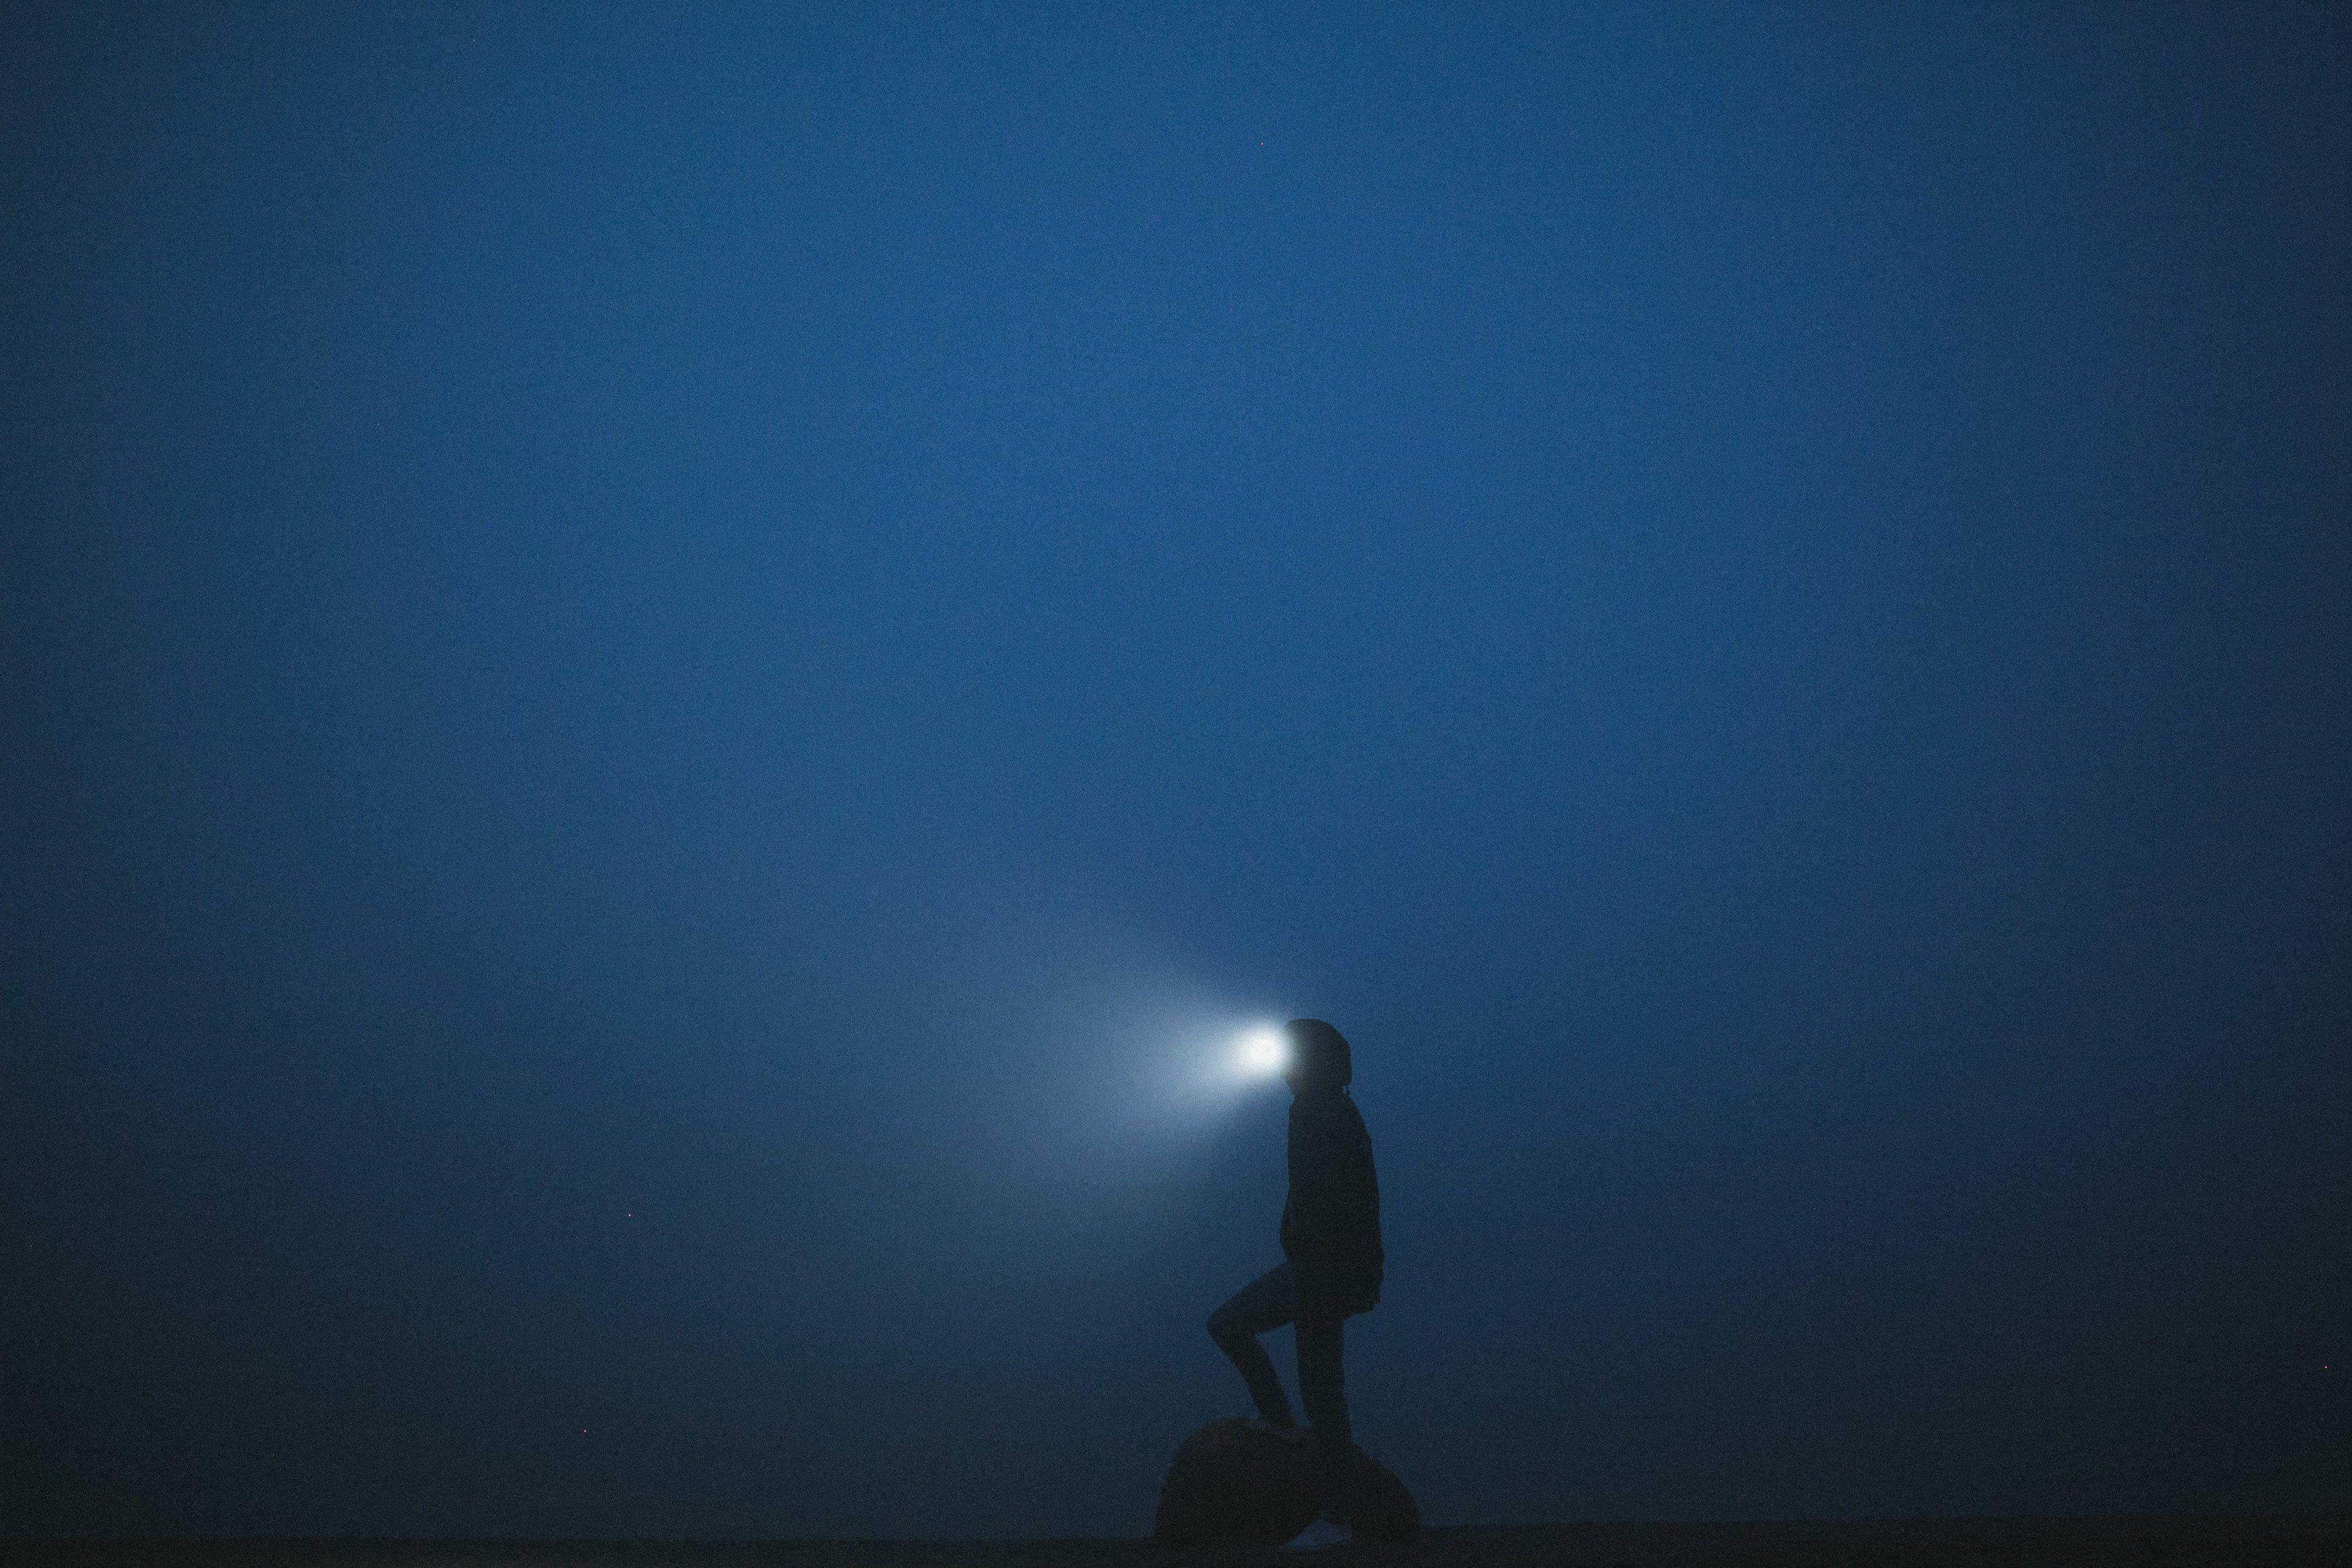 ночь свет туман , Воронин Вова